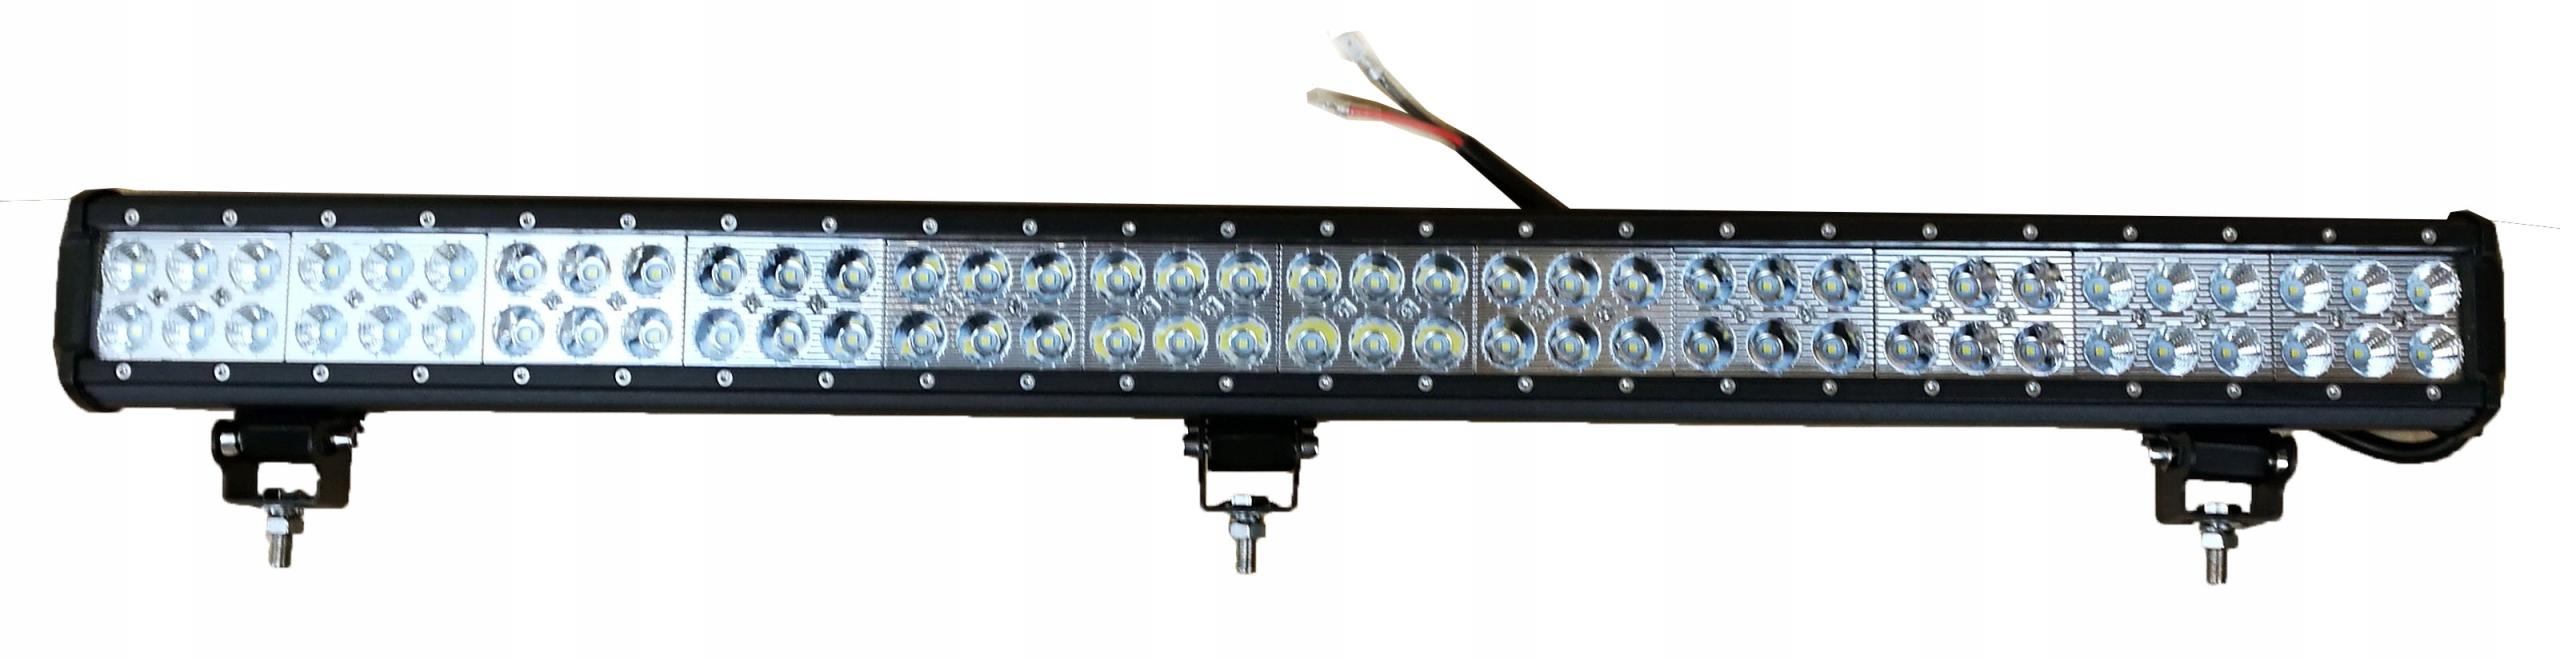 панель led галоген дальнего света планка 216w33' 84cm